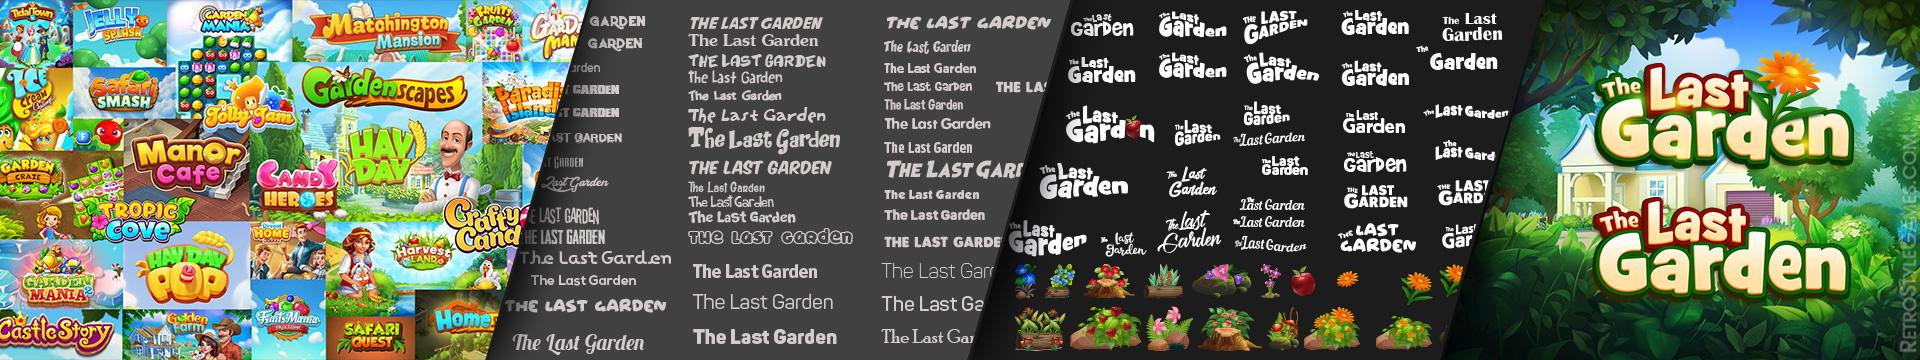 Ref Font Style for Game Logo Draft WIP Last Garden